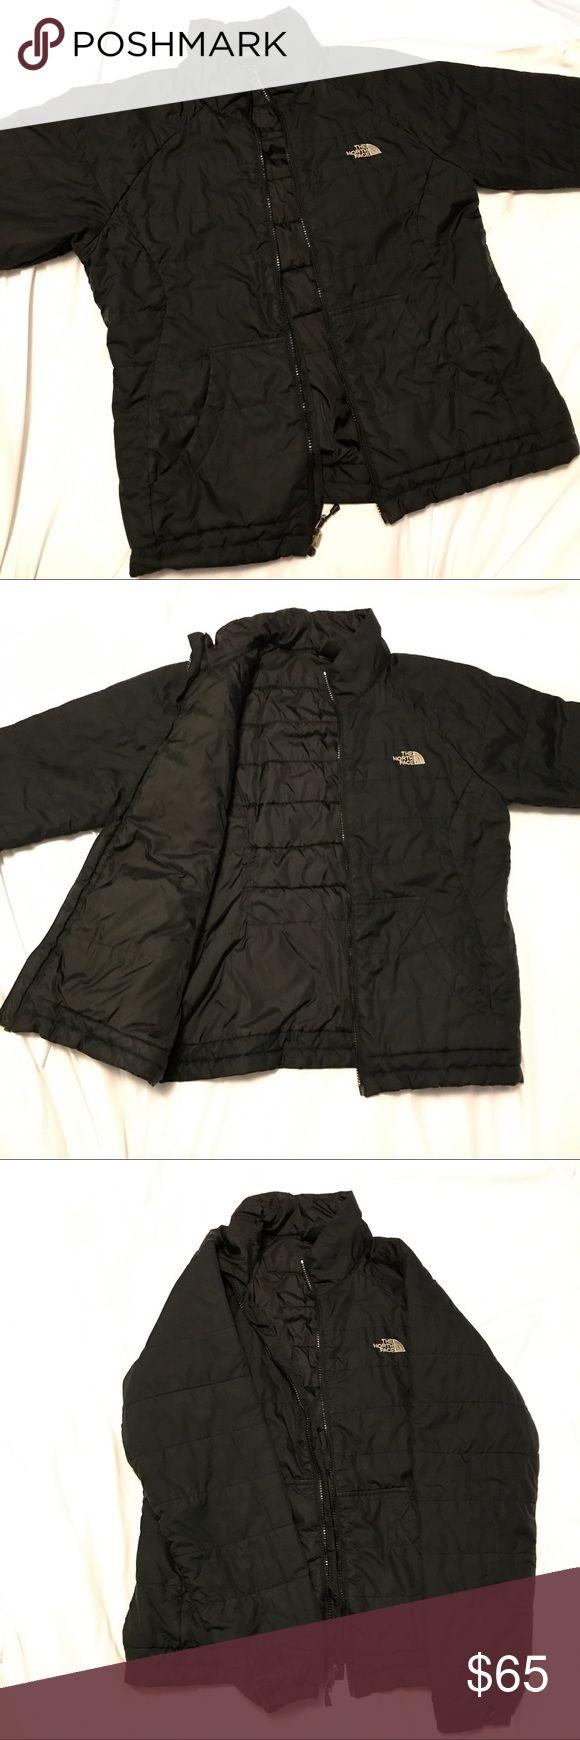 North Face black zip up jacket The North Face black zip up jacket EUC. No flaws. Keeps you warm and is light weight The North Face Jackets & Coats